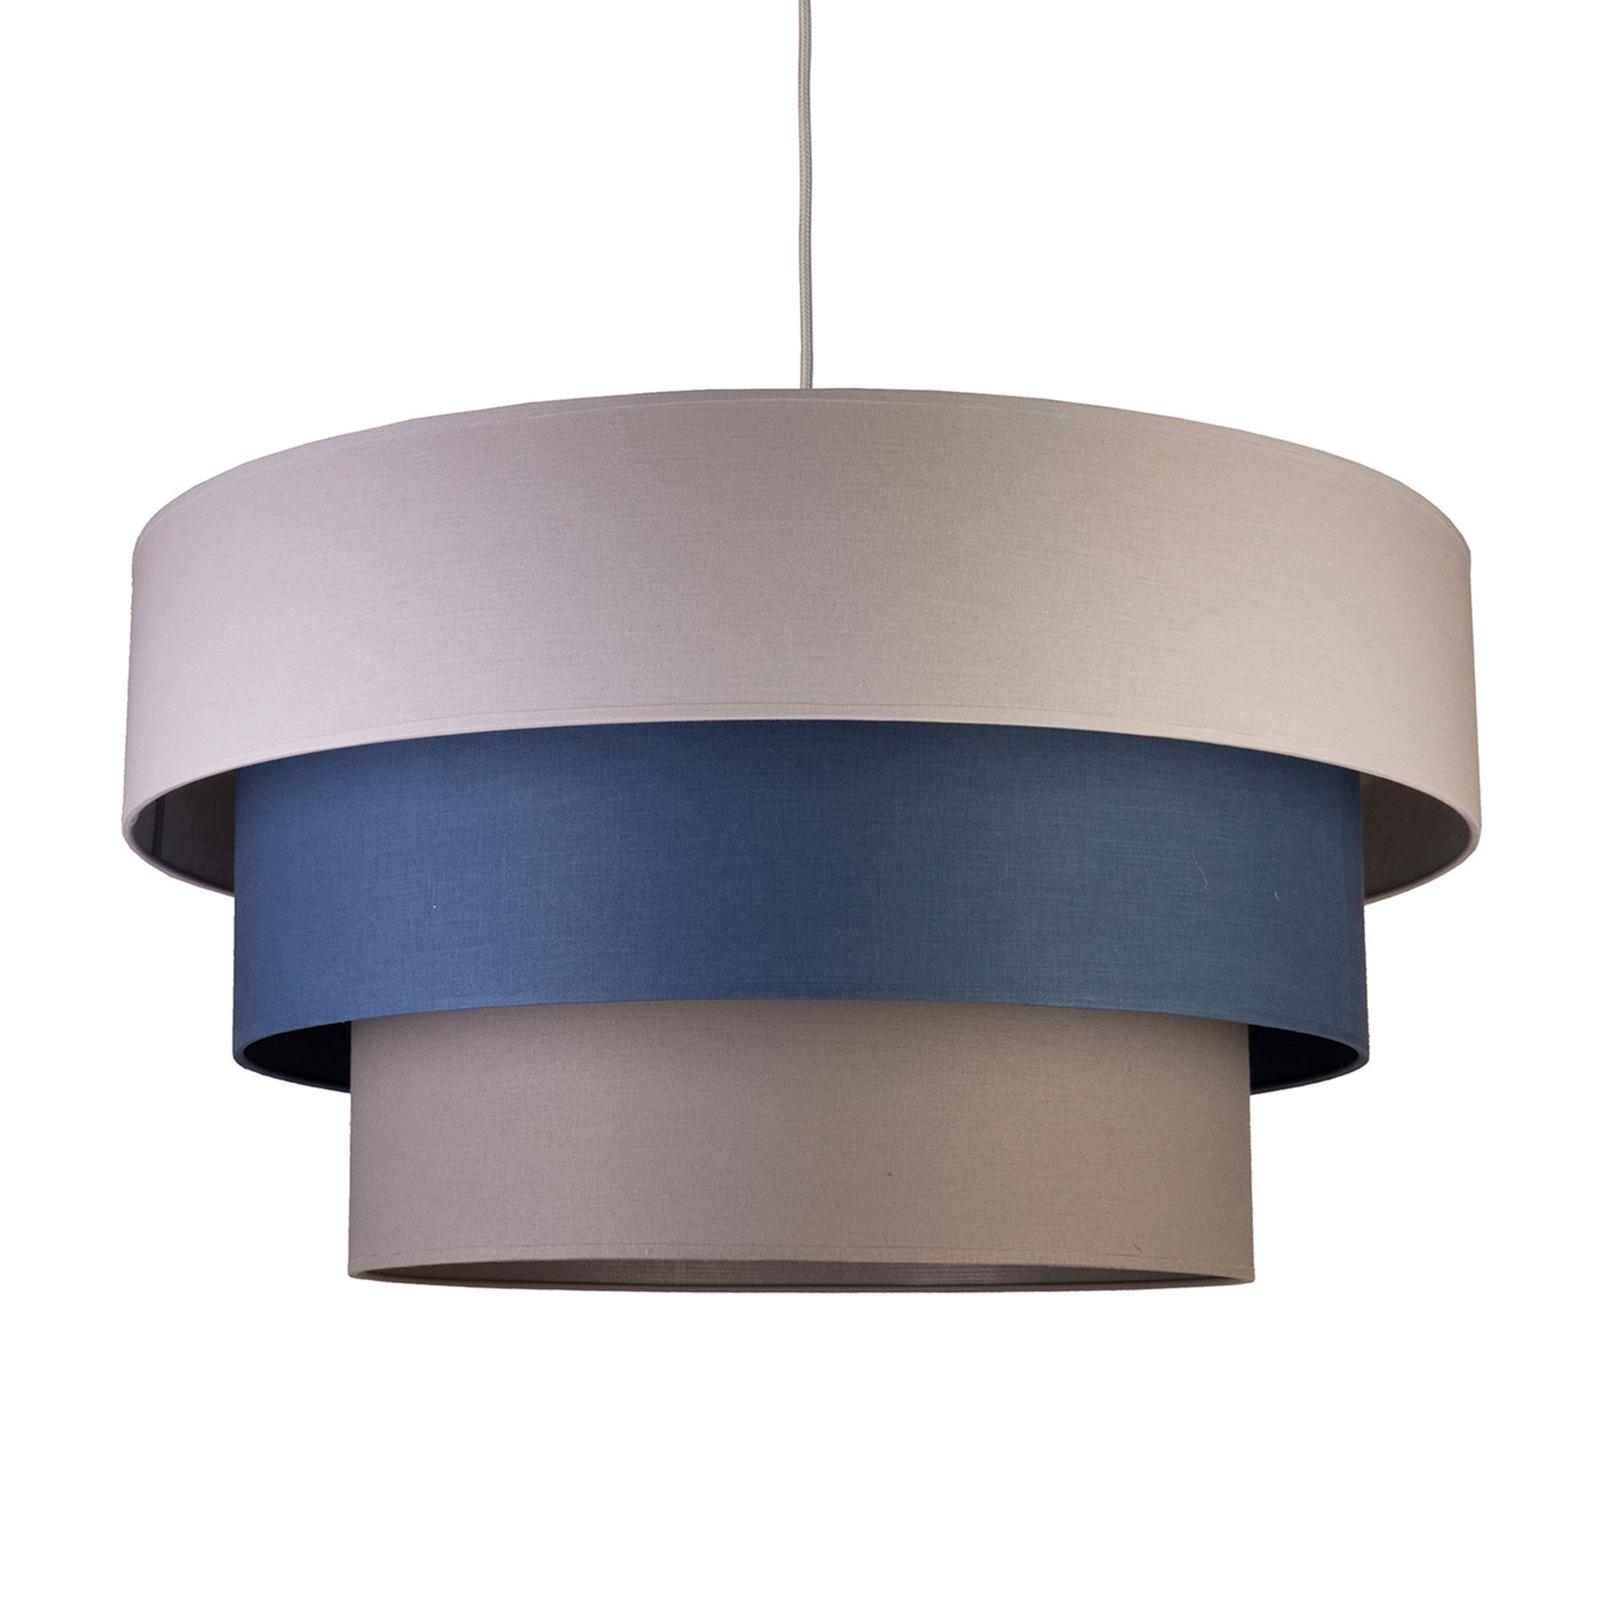 Lampada sospensione Luneta, tessuto grigio/blu